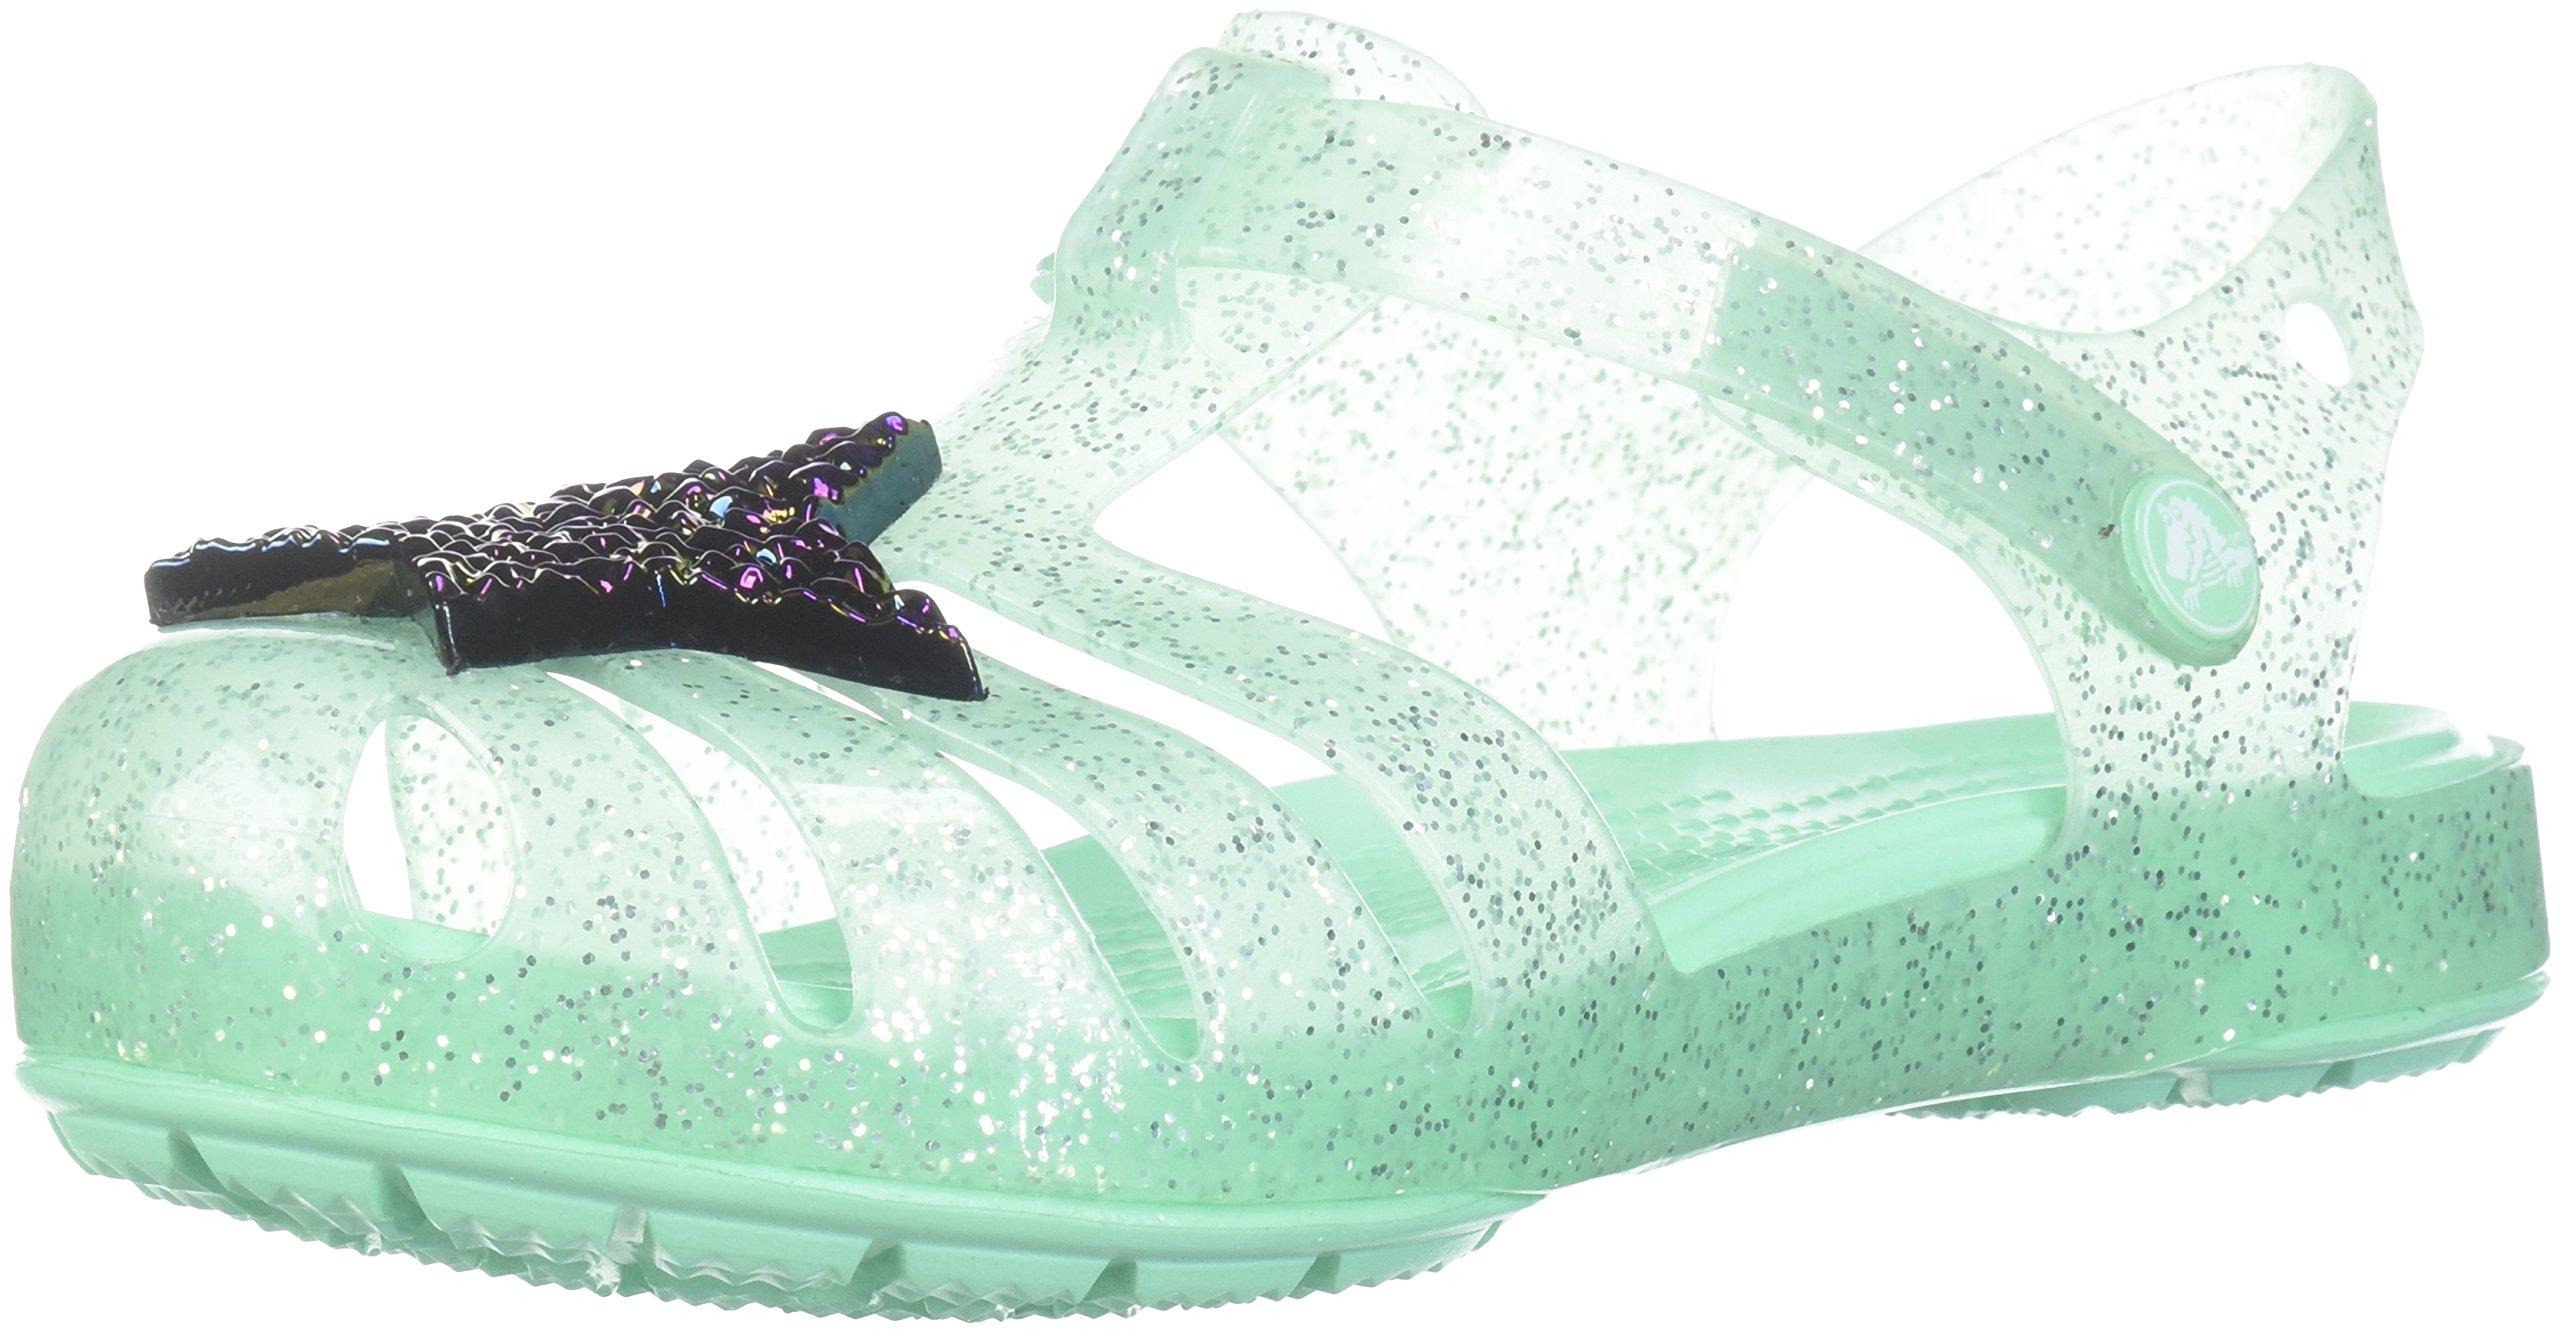 Crocs Girls' Isabella Novelty Flat Sandal, Mint, 13 M US Little Kid